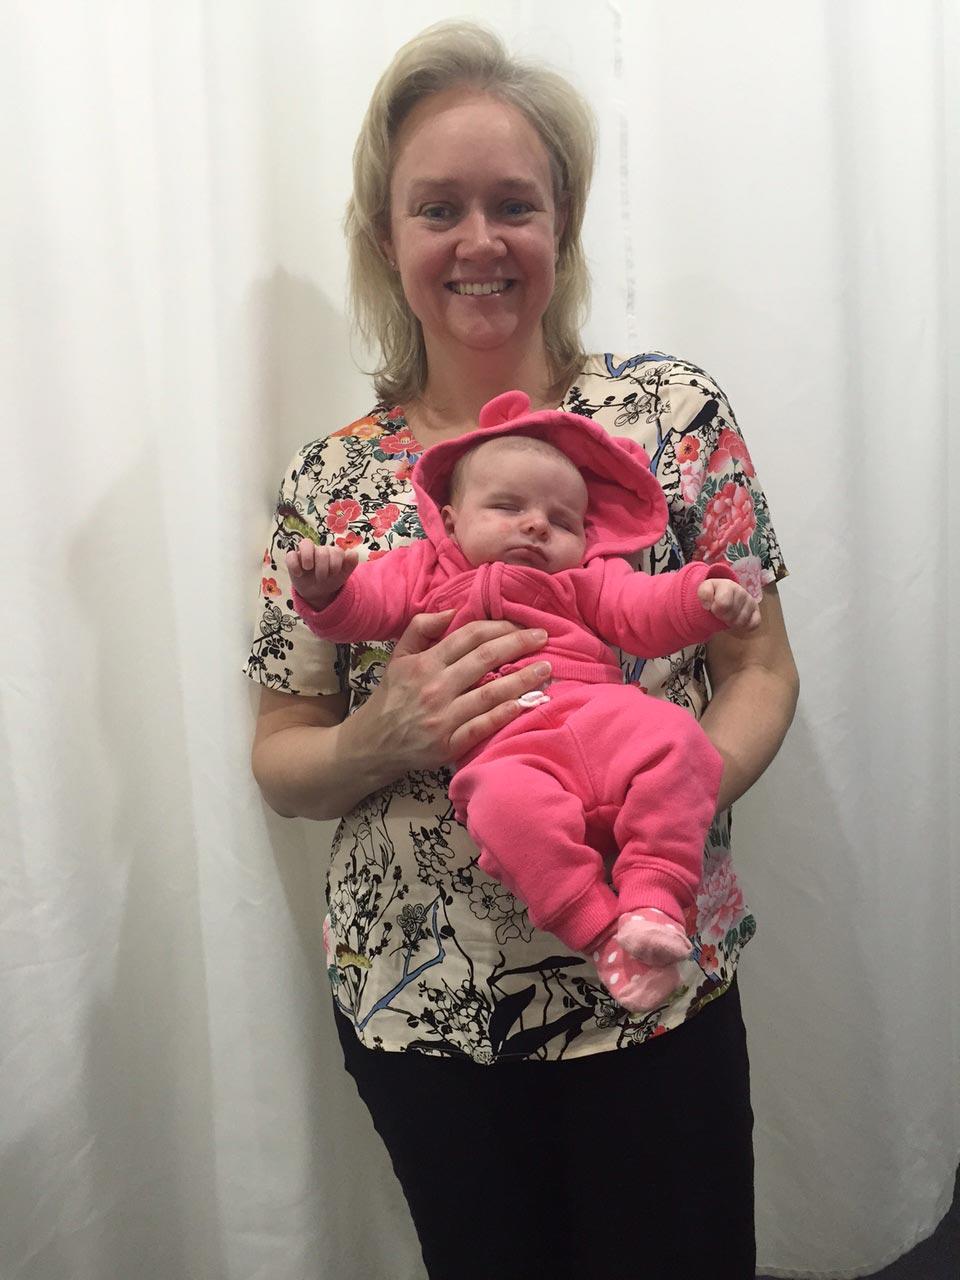 Melbourne-based-Specialist-Obstetrician_Dr-Karen-paice